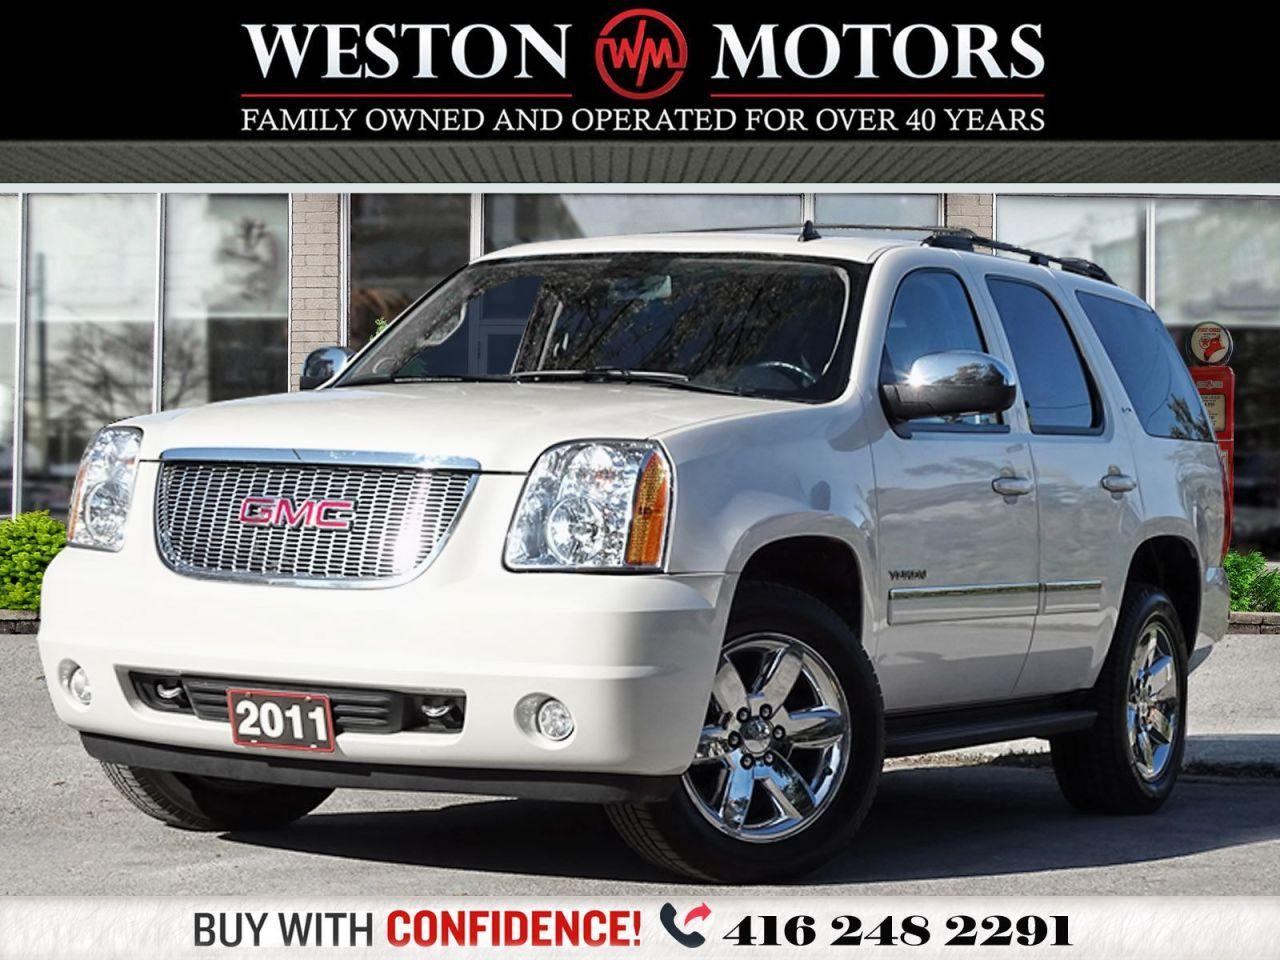 2011 GMC Yukon 4WD*LEATHER*SUNROOF*7PASS*NAVI*REVERSE CAMERA!!*